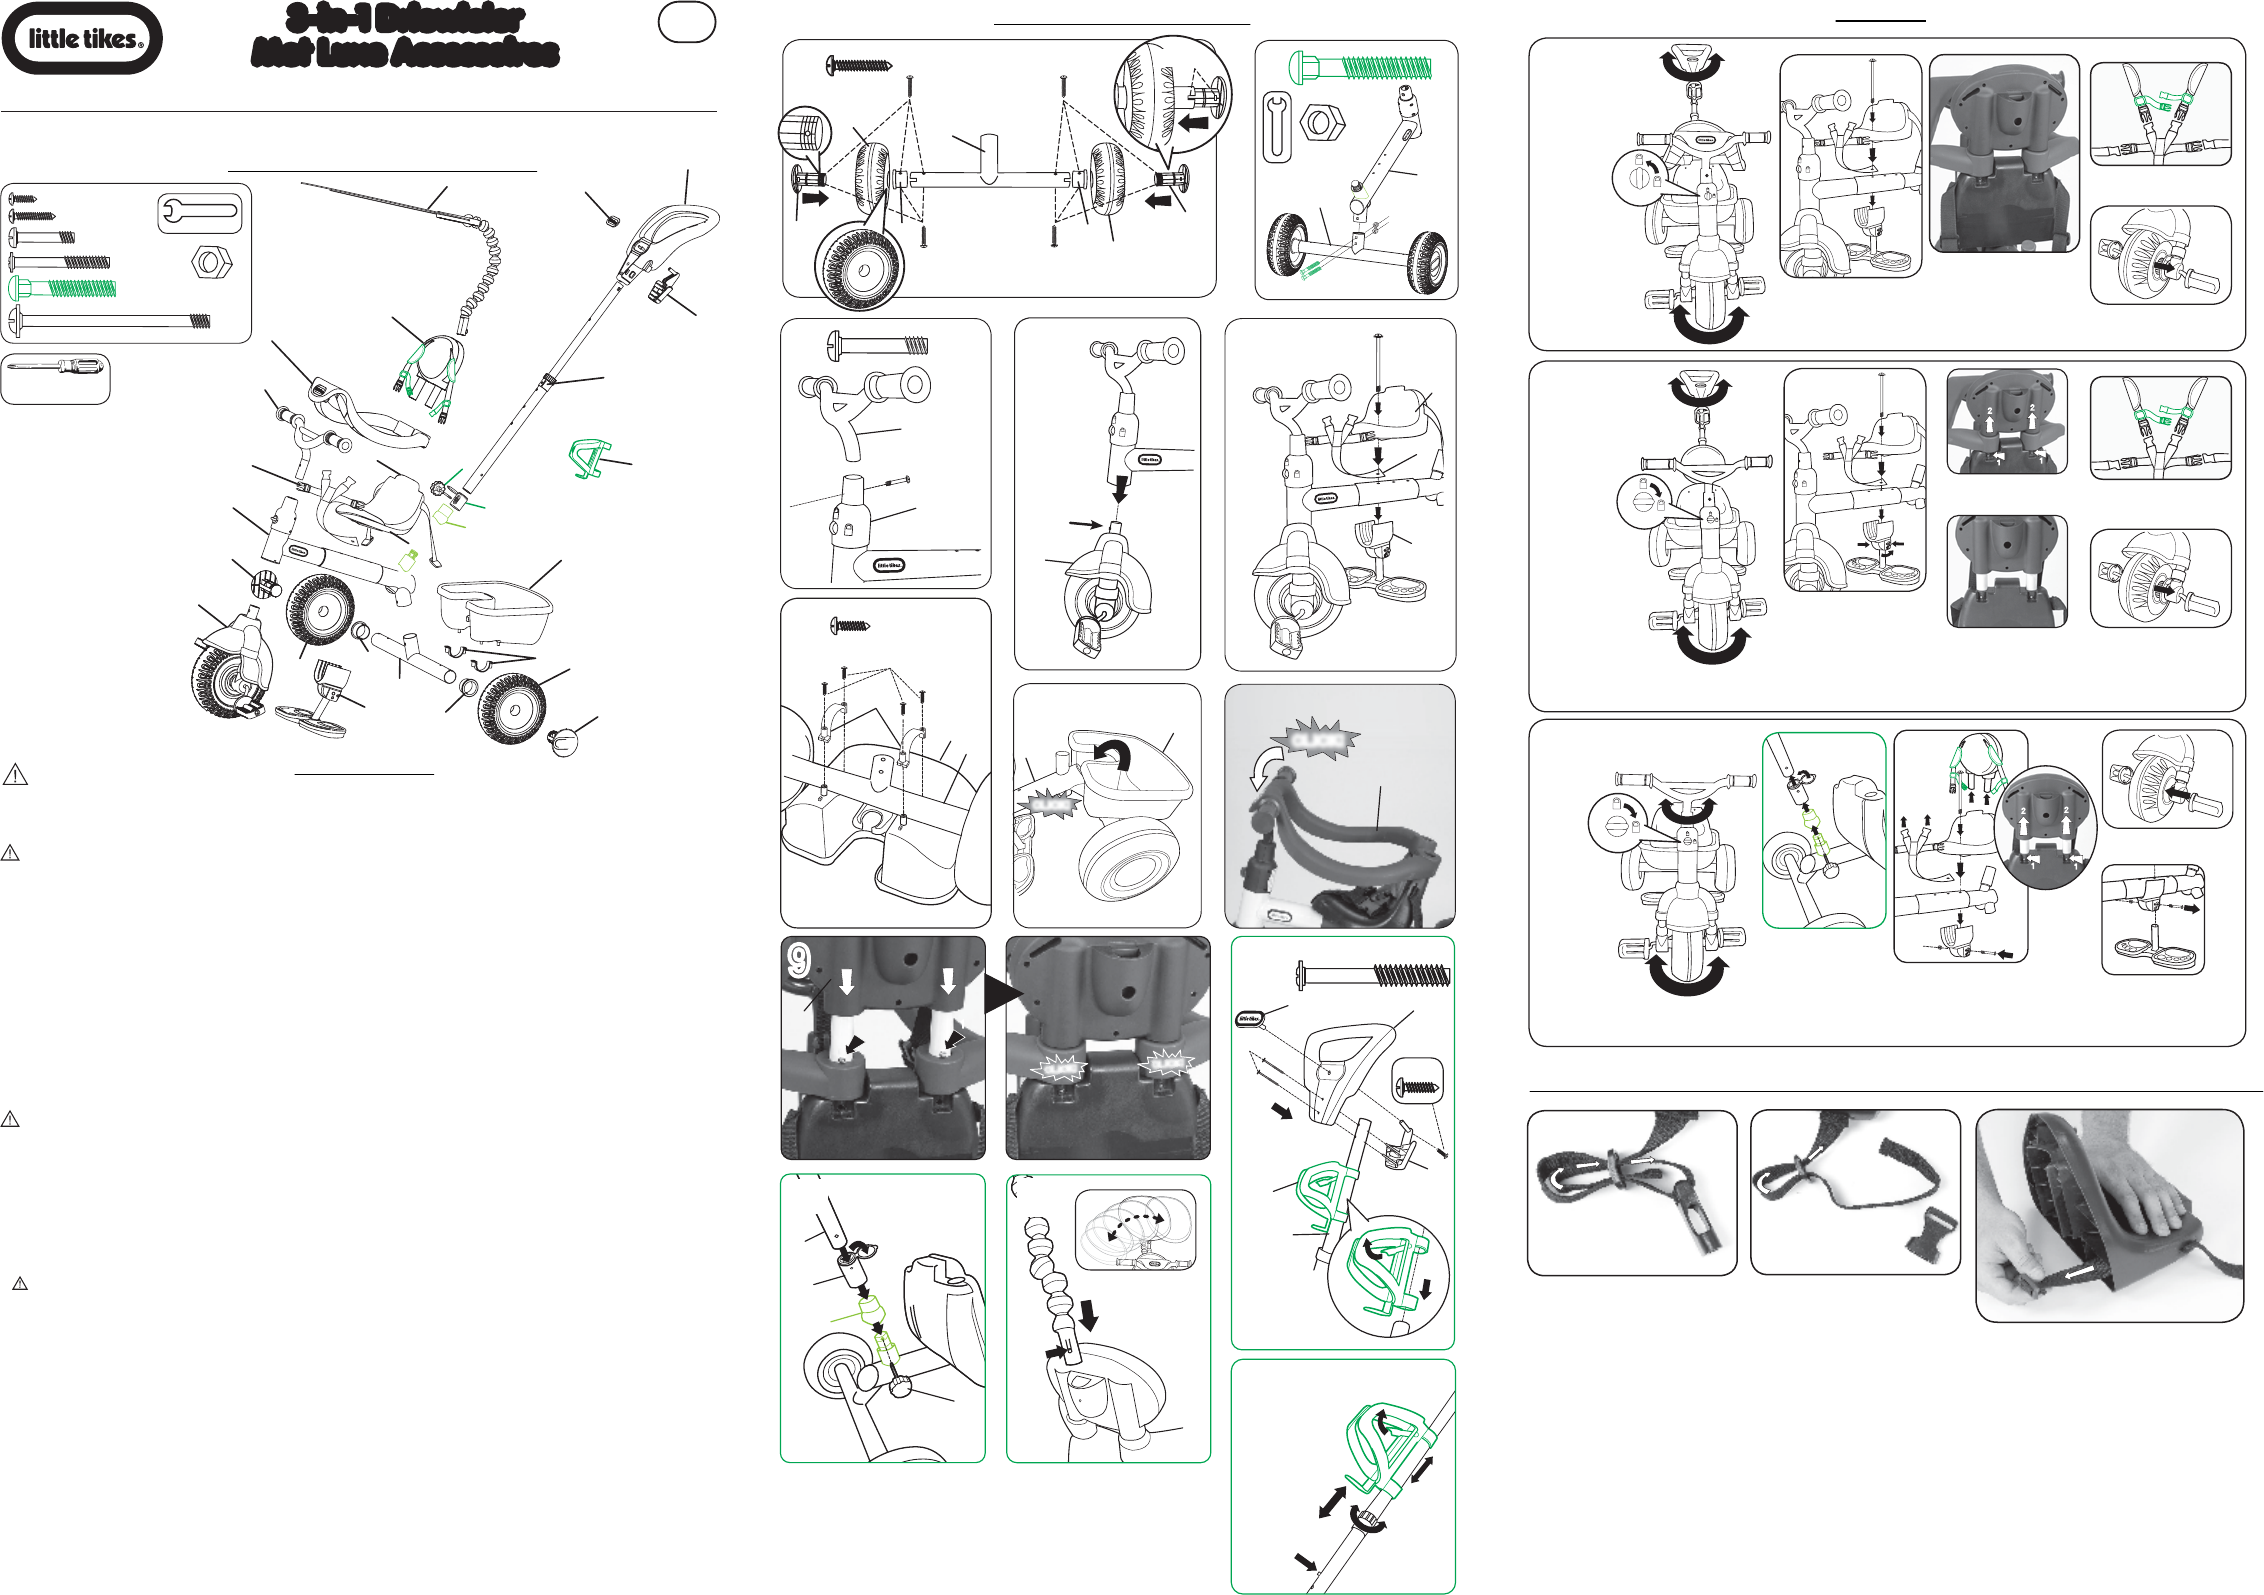 Peuterbed Little Tikes.Handleiding Little Tikes 3 In 1 Trike 627002mx2 Pagina 10 Van 12